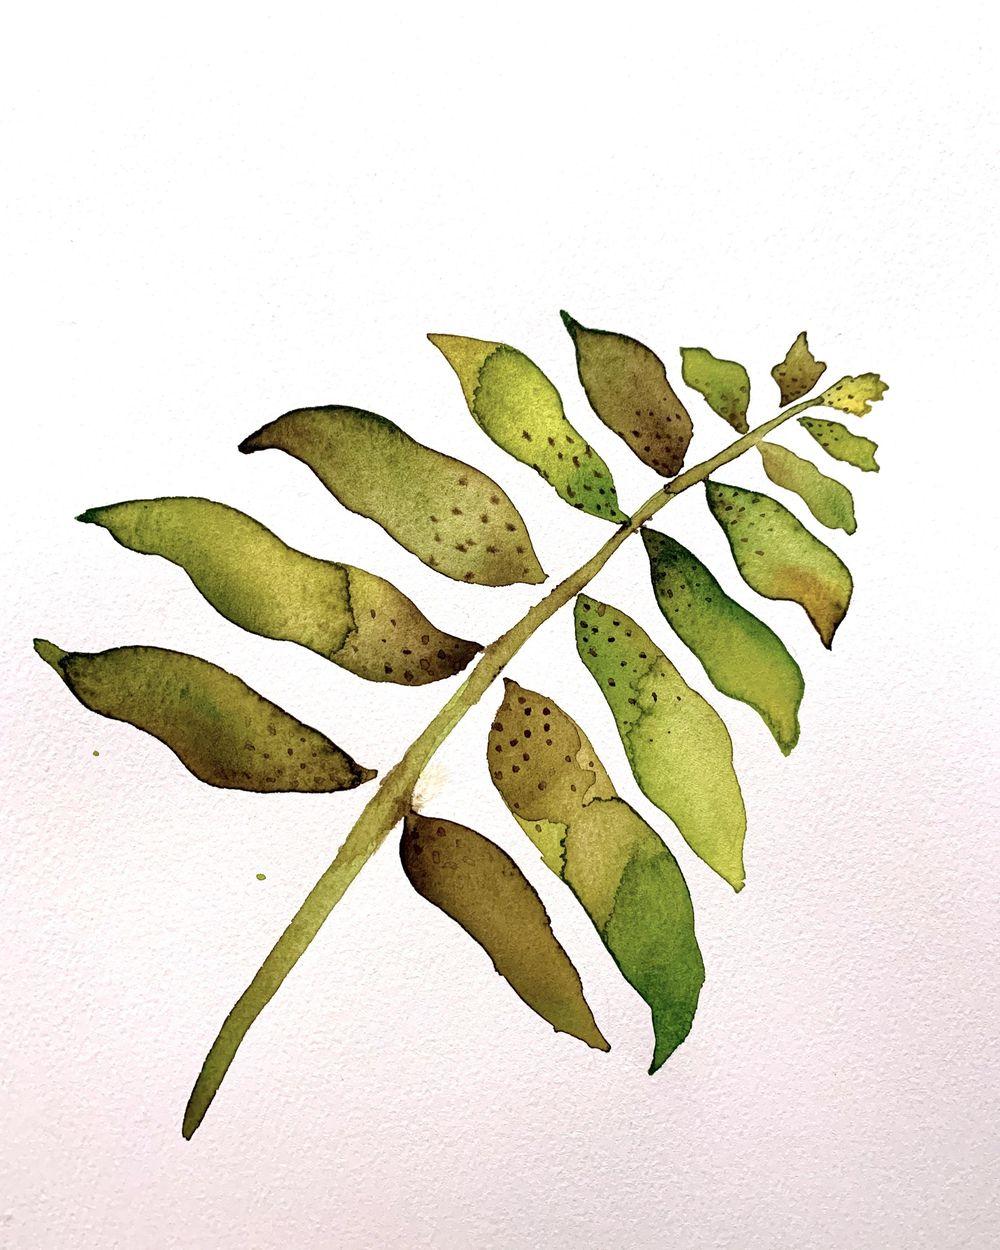 Watercolor Techniques - Leaf - image 3 - student project